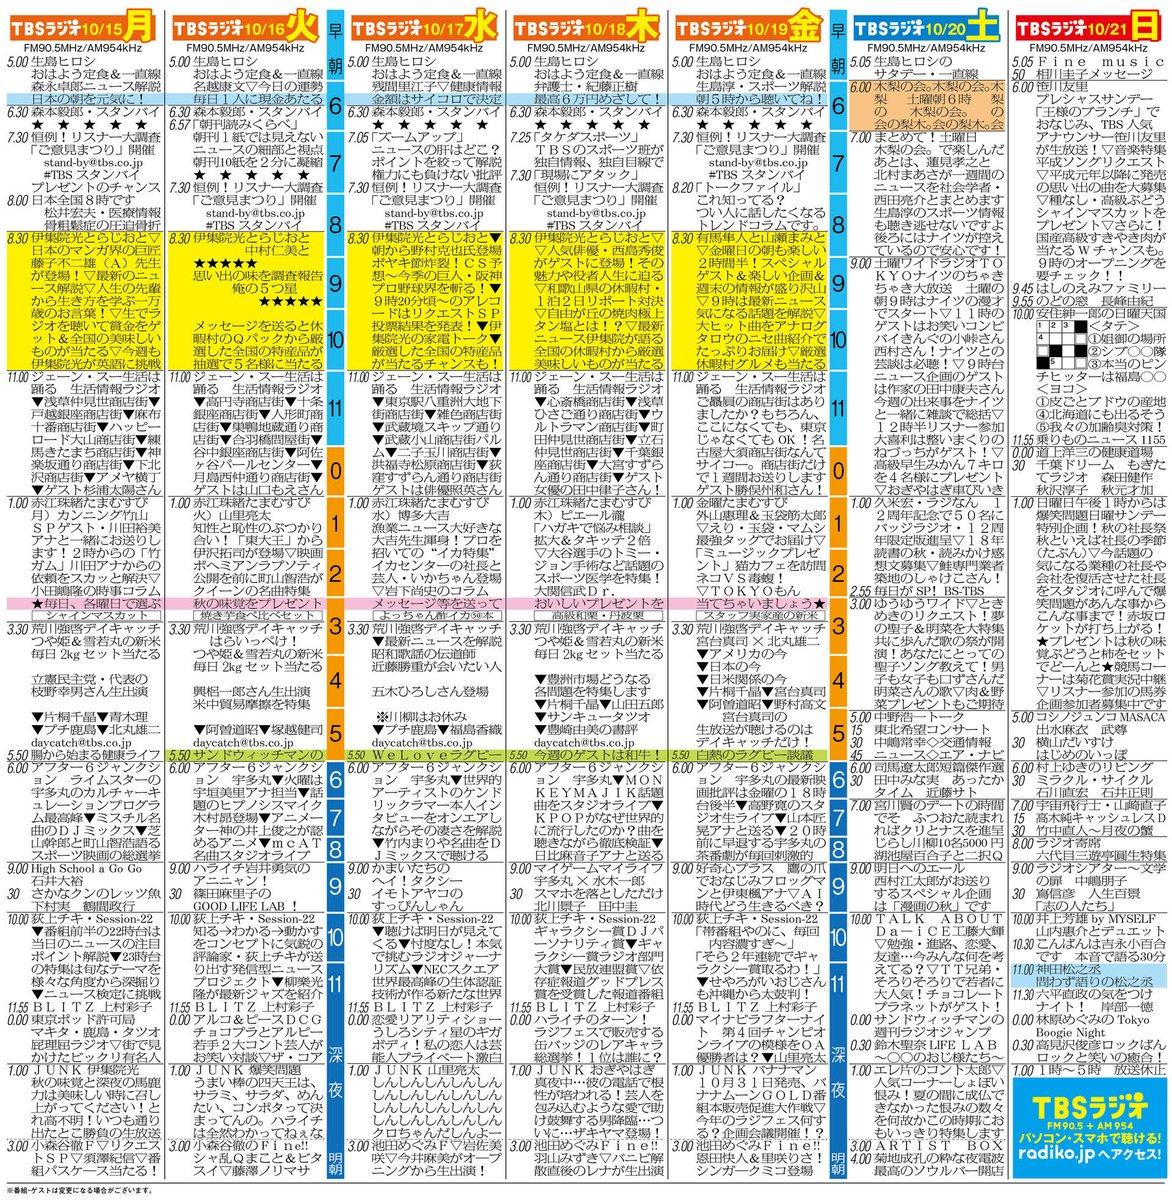 "TBSラジオ FM90.5&AM954 على تويتر: ""スペシャルウィーク開催中 ..."